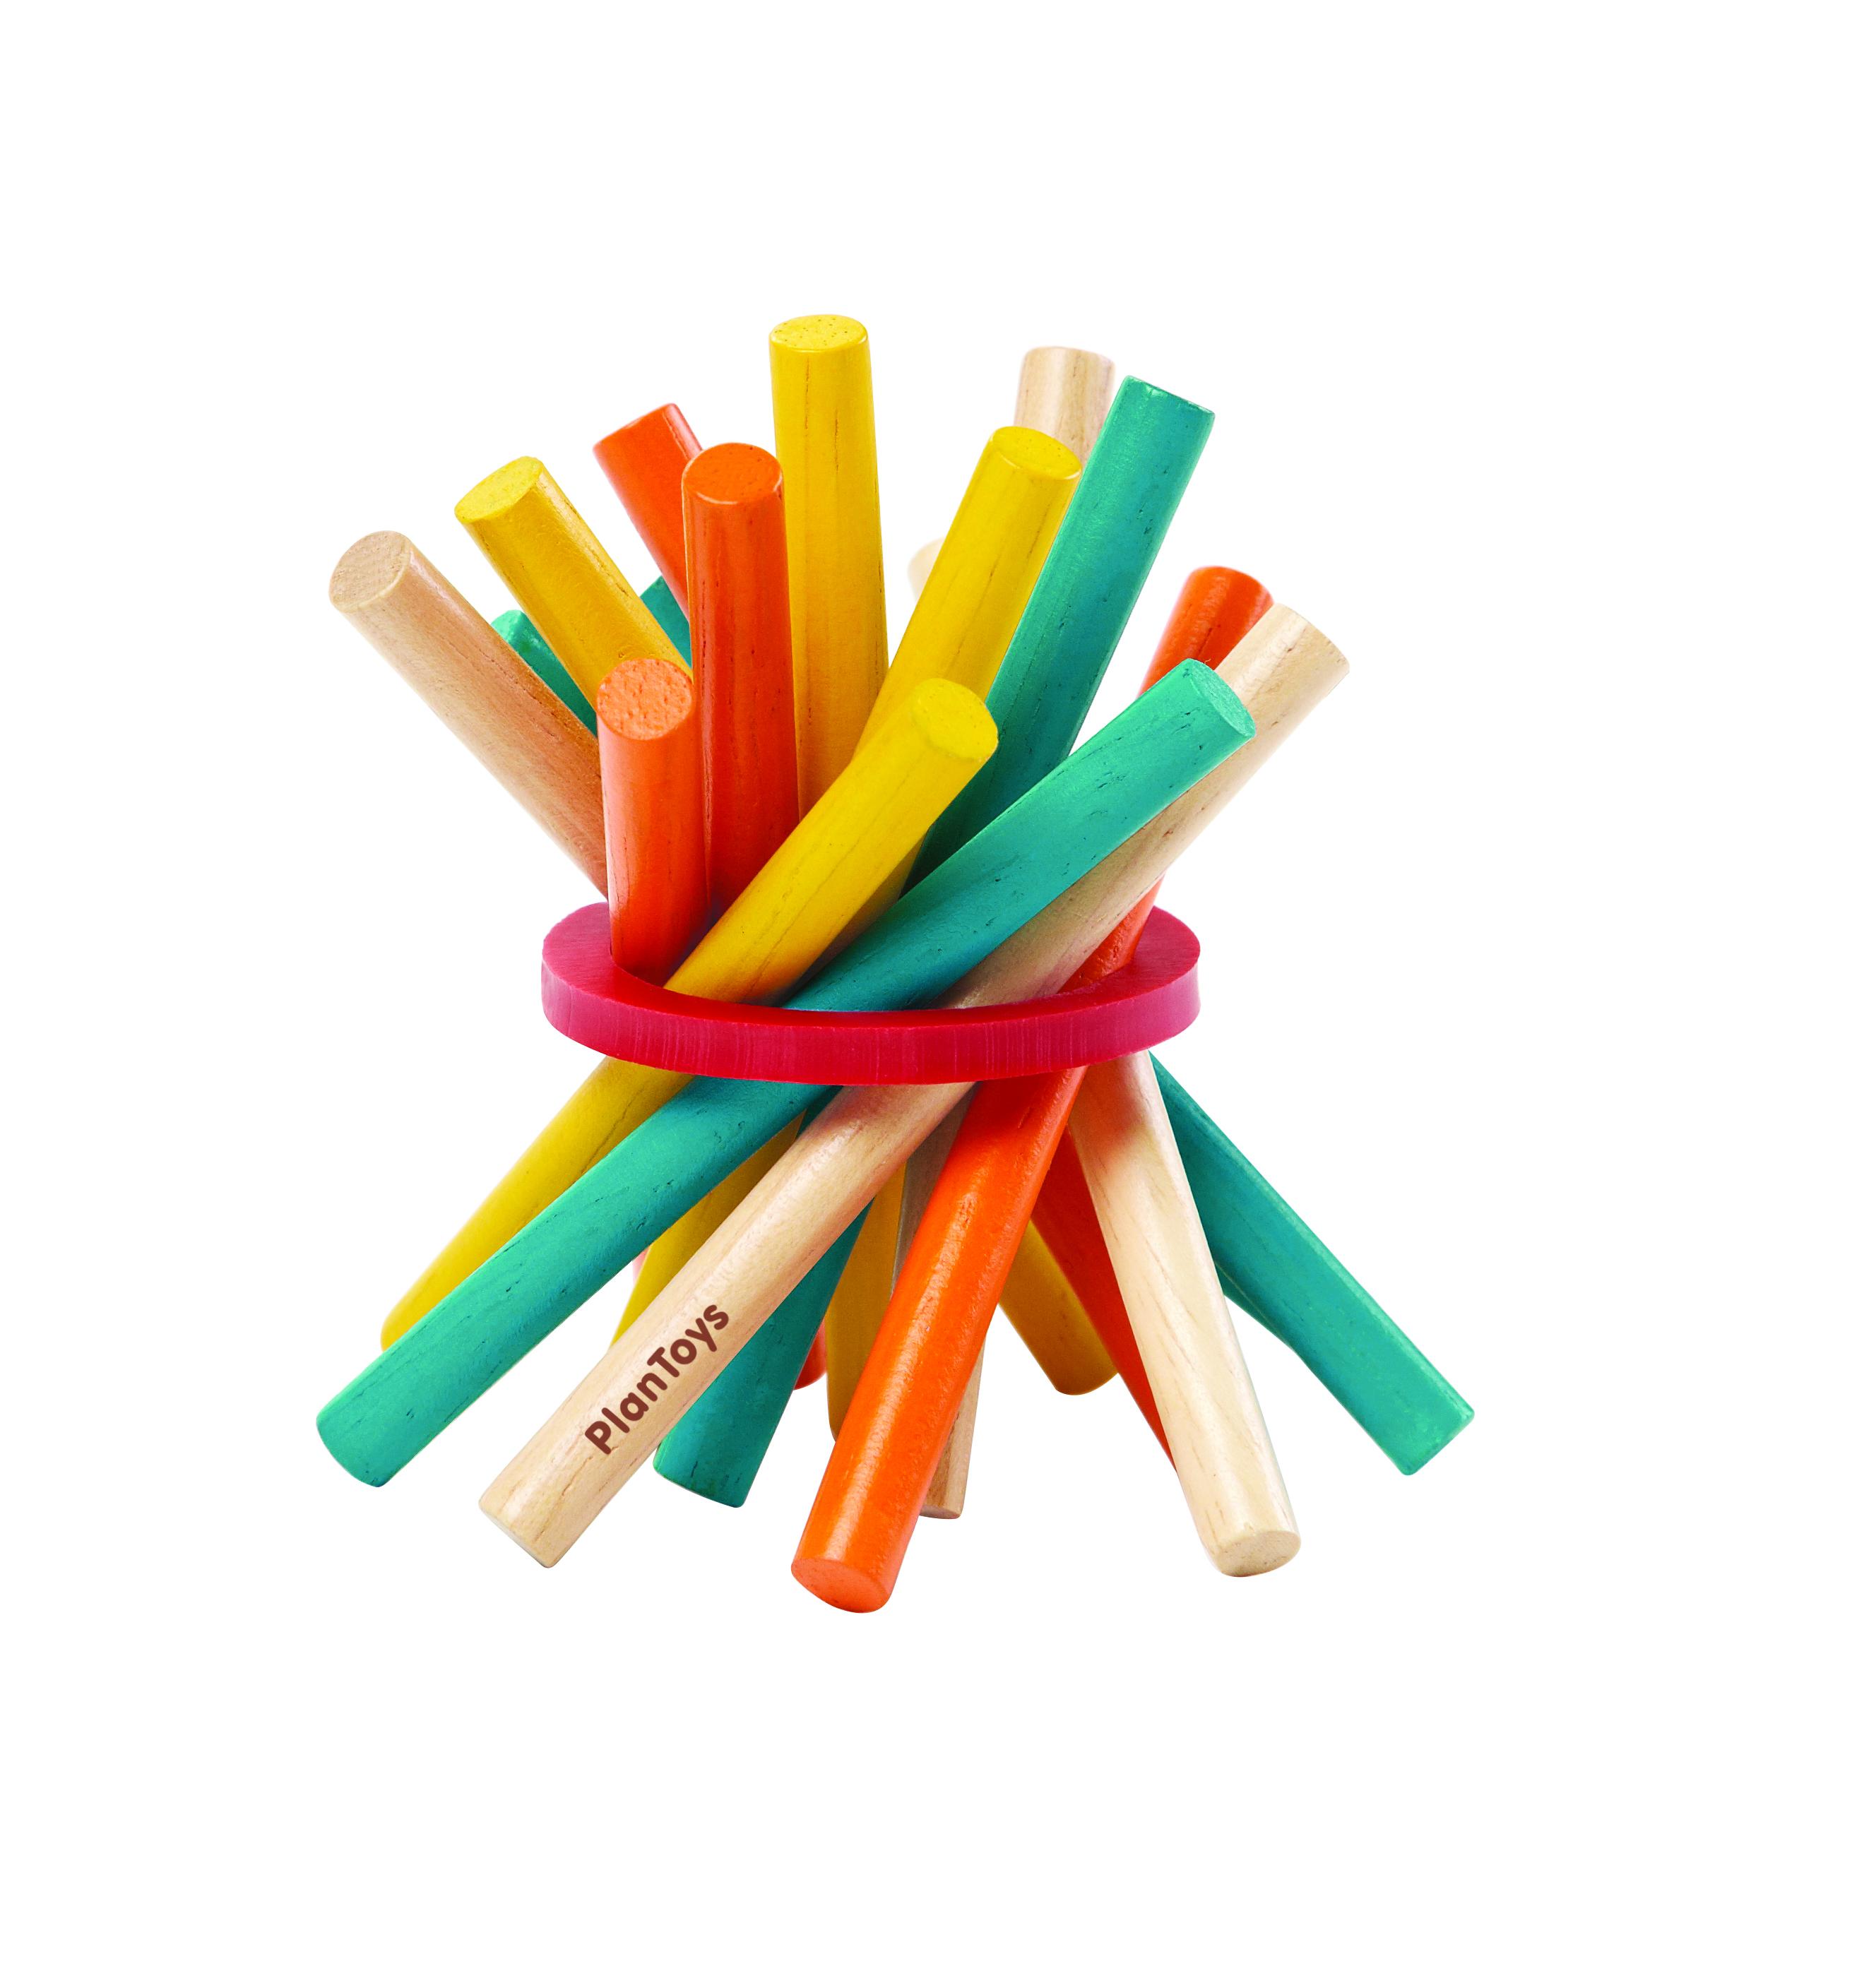 Plan Toys - pick-up sticks